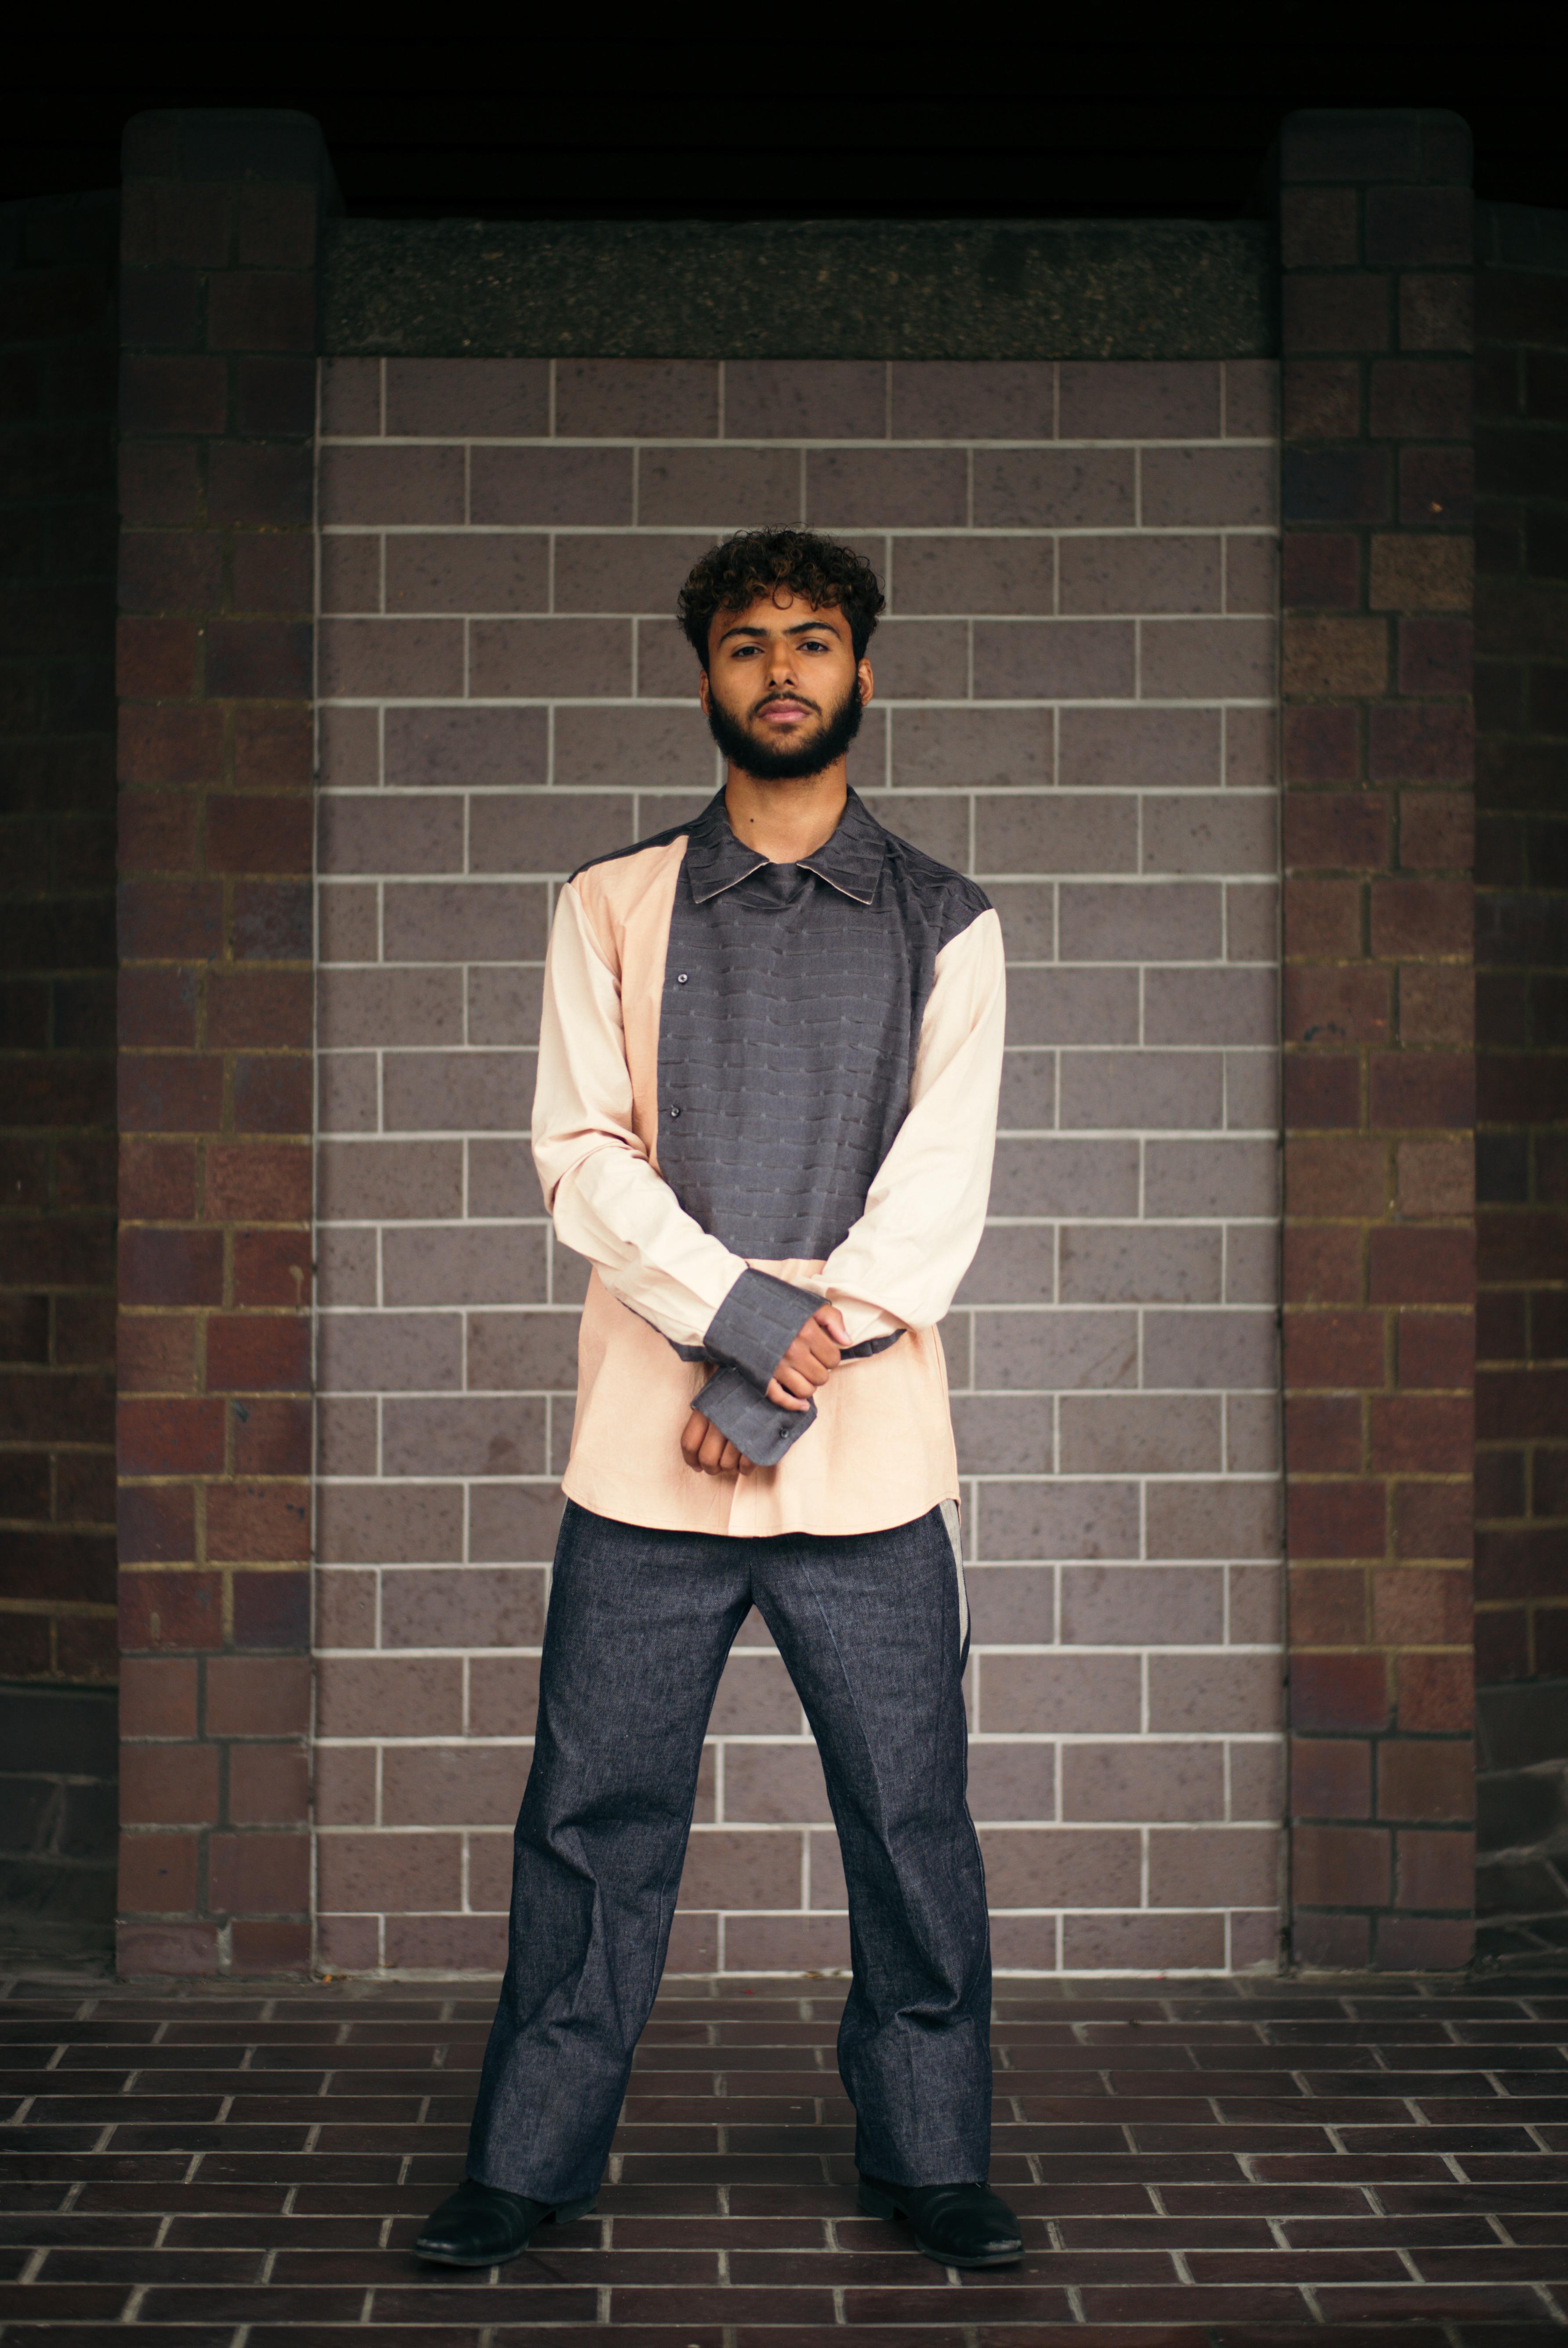 Blush & grey shirt, denim trousers